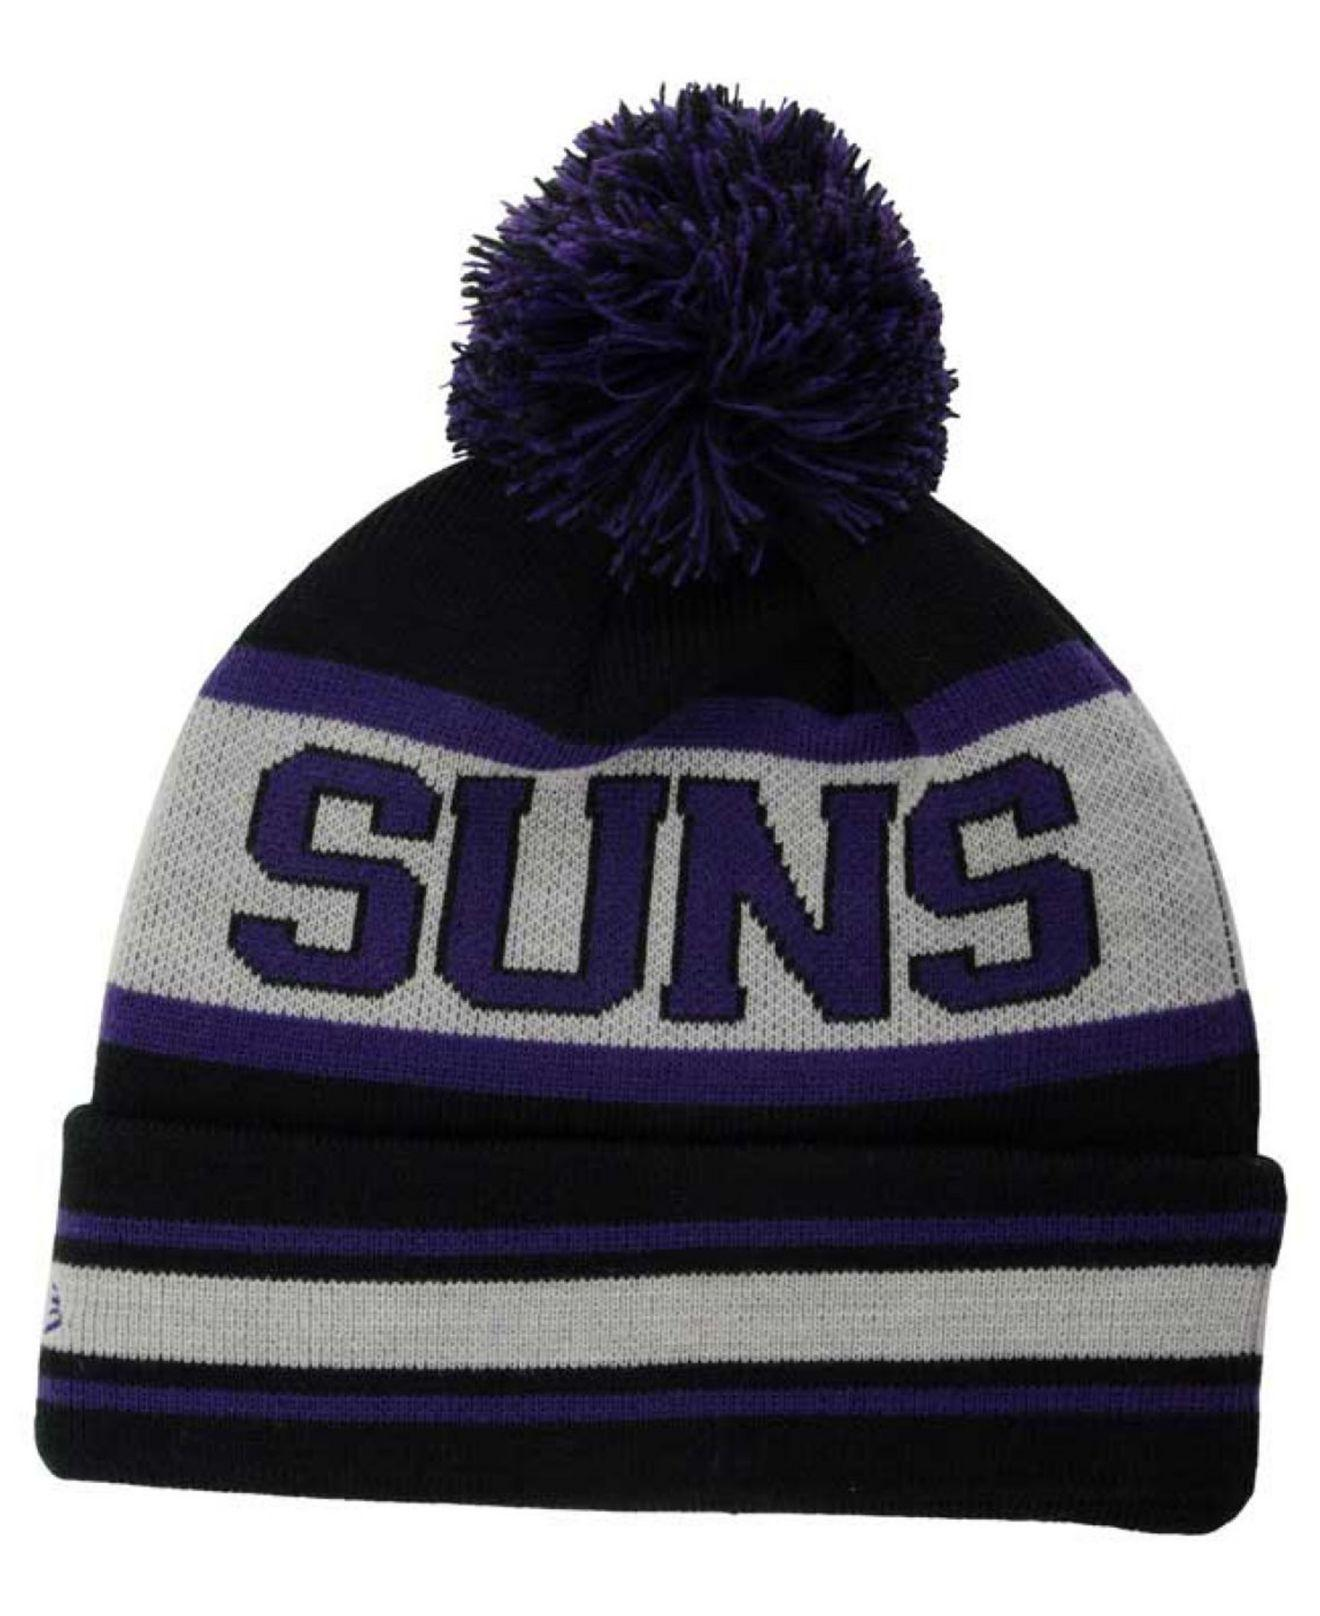 sports shoes 8d4a0 39232 ... new zealand lyst ktz phoenix suns fashion biggest fan knit hat in  purple for men a7e30